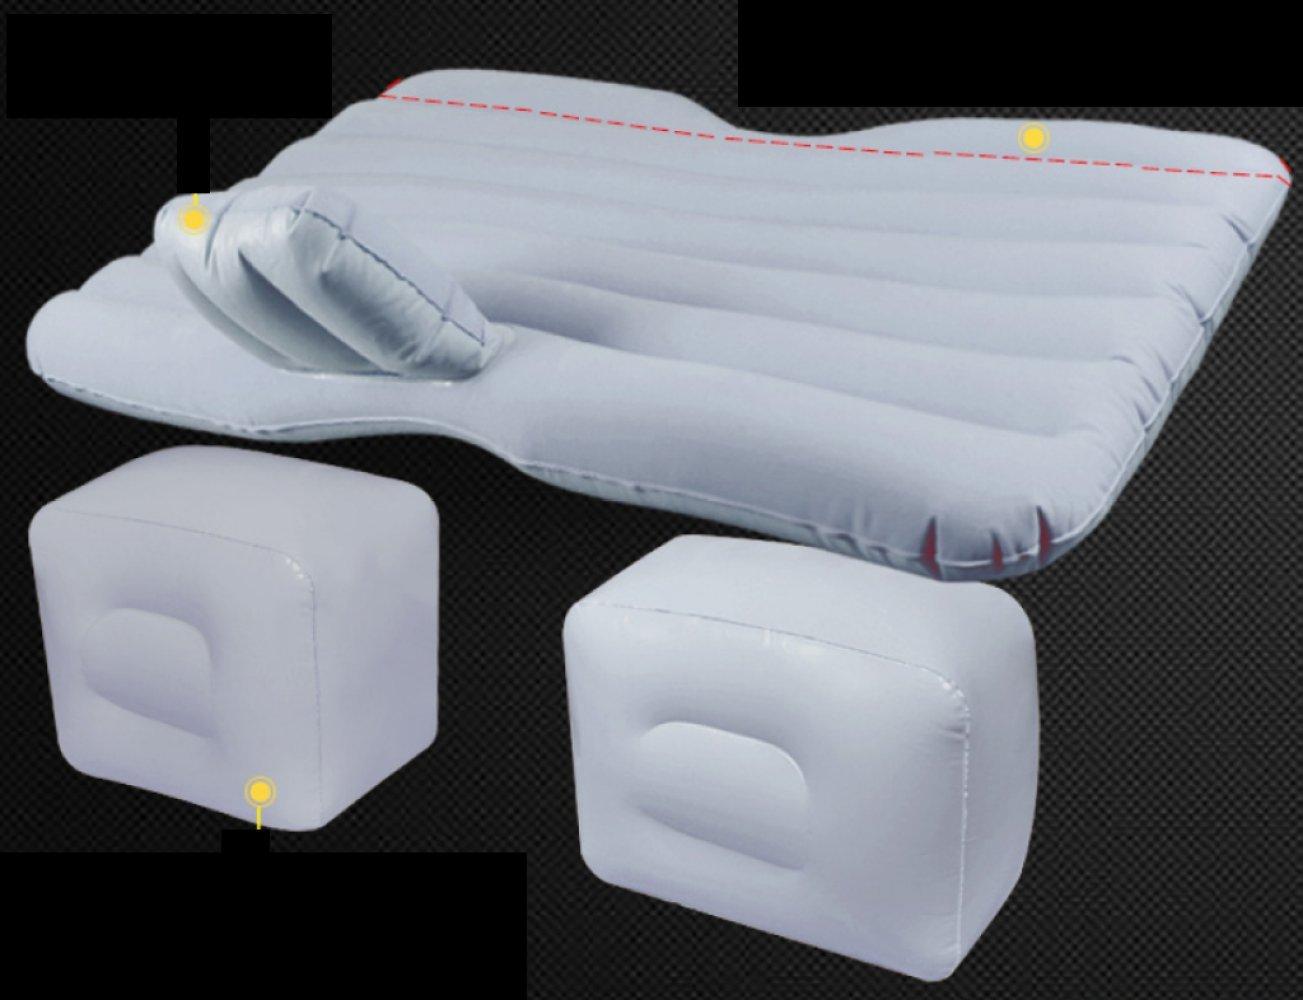 ERHANG Luftmatratzen Aufblasbares Bett Rear Seat Outdoor Reisebett SUV Auto Bett Isomatte,Blau